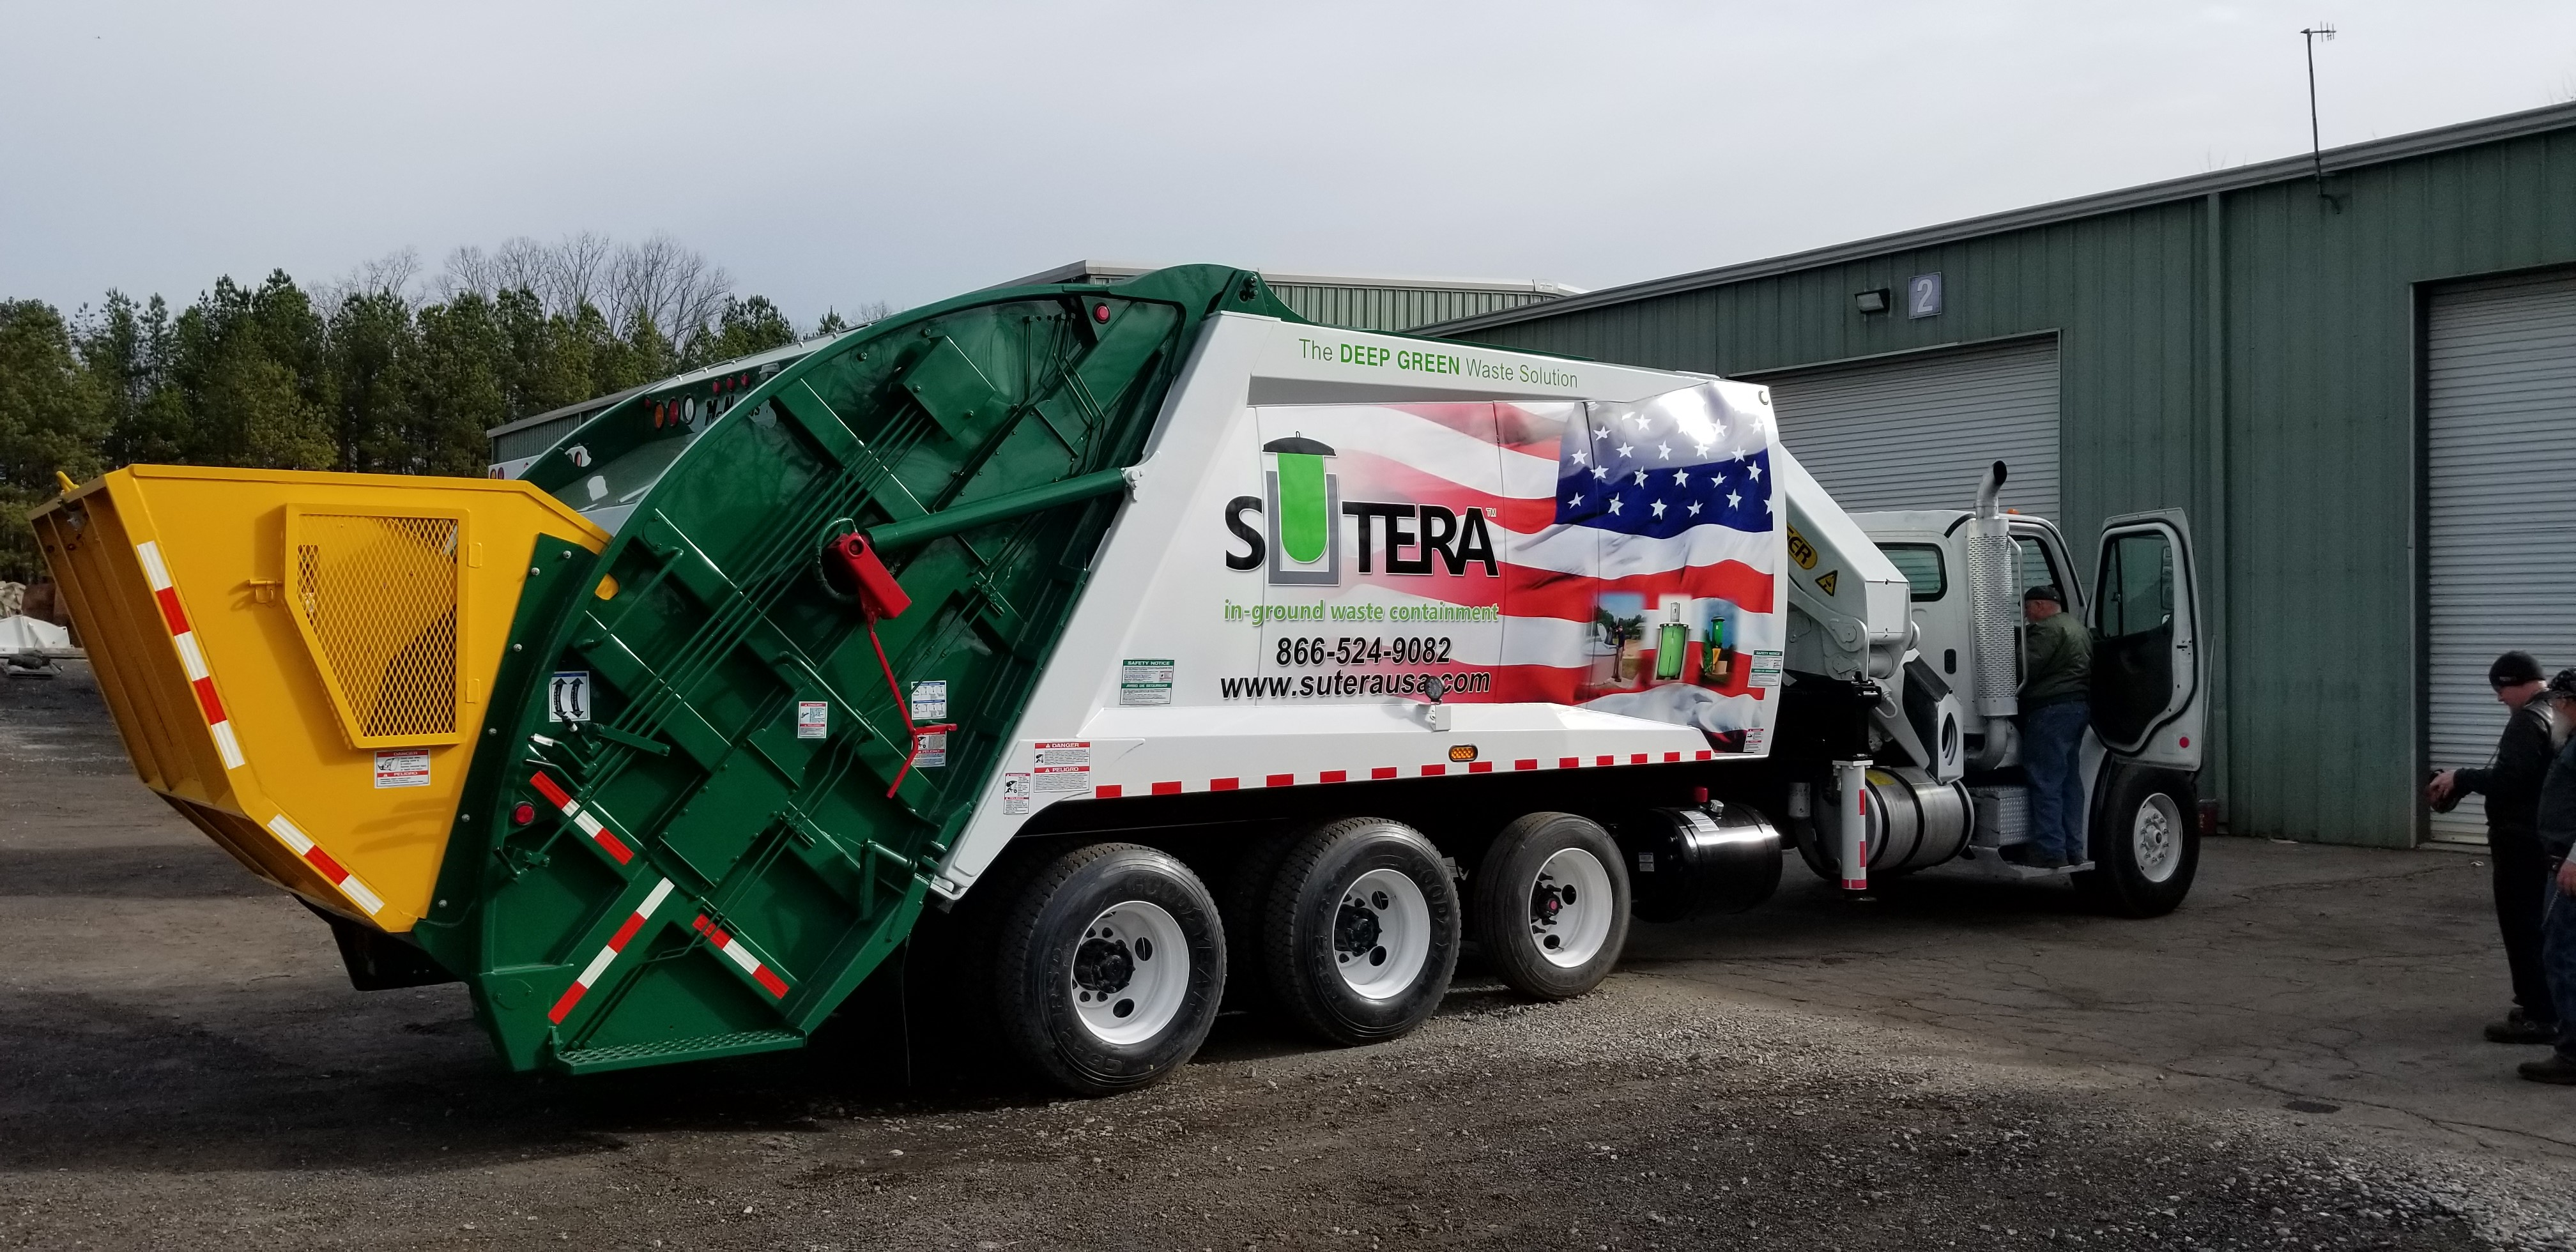 SUTERA Truck #2